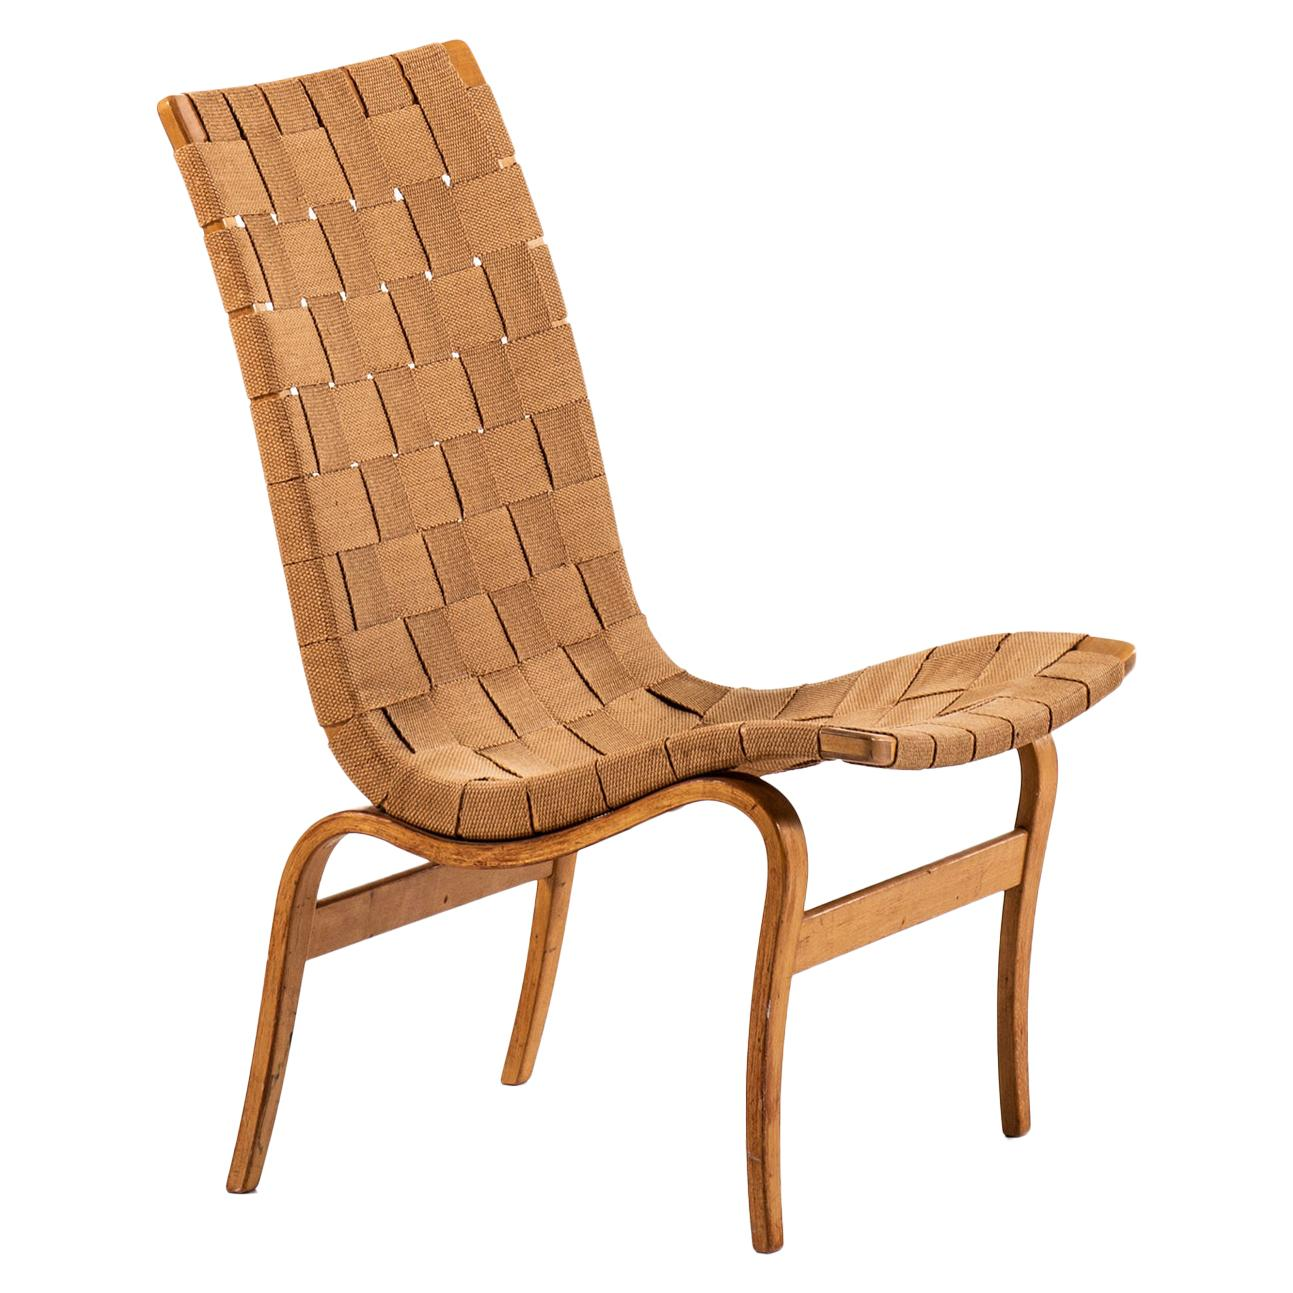 Bruno Mathsson Early Eva Easy Chair by Karl Mathsson in Värnamo, Sweden